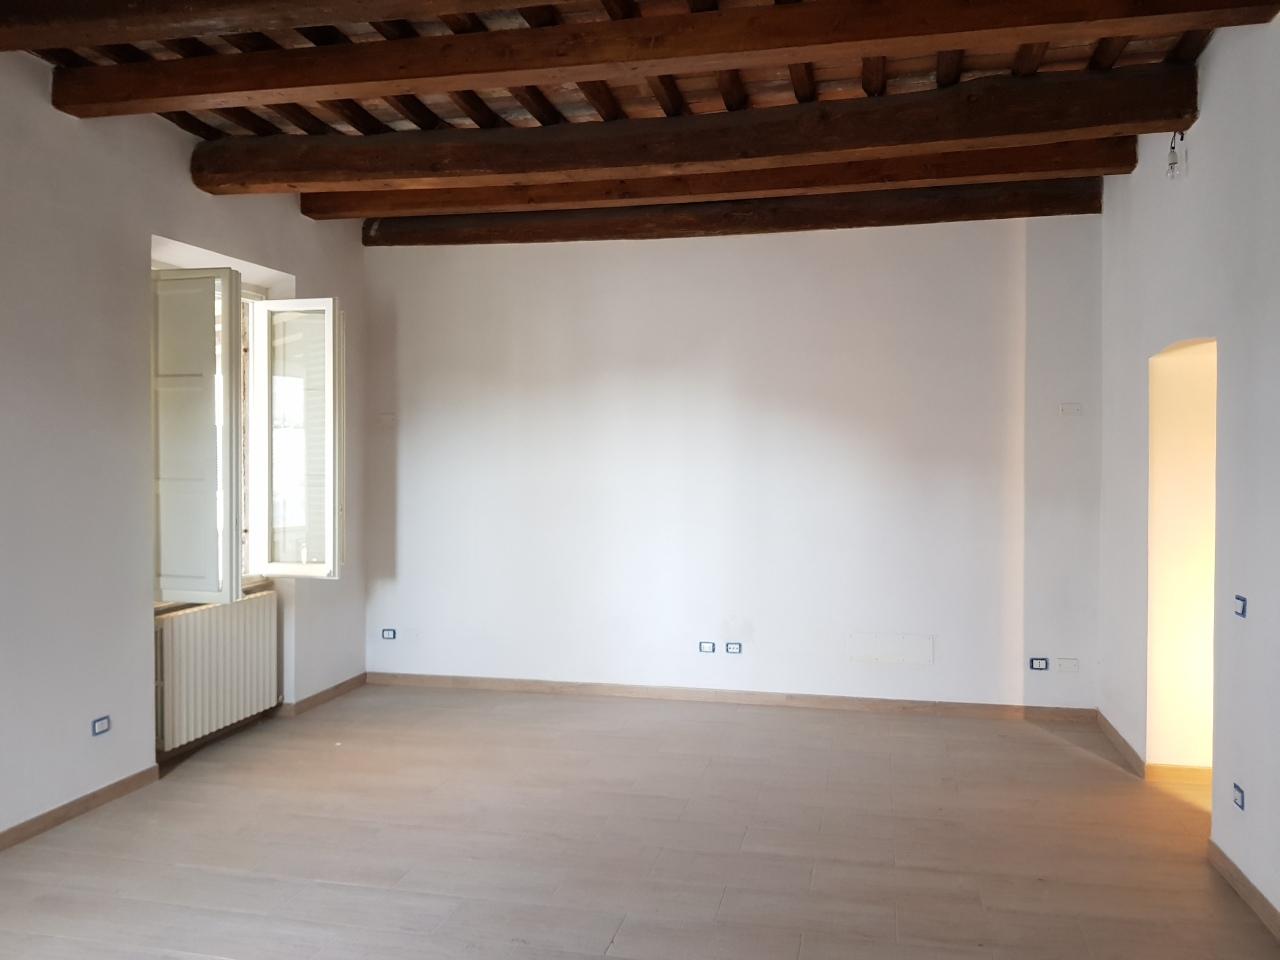 Appartamento - sestalocale a Arancio, Lucca